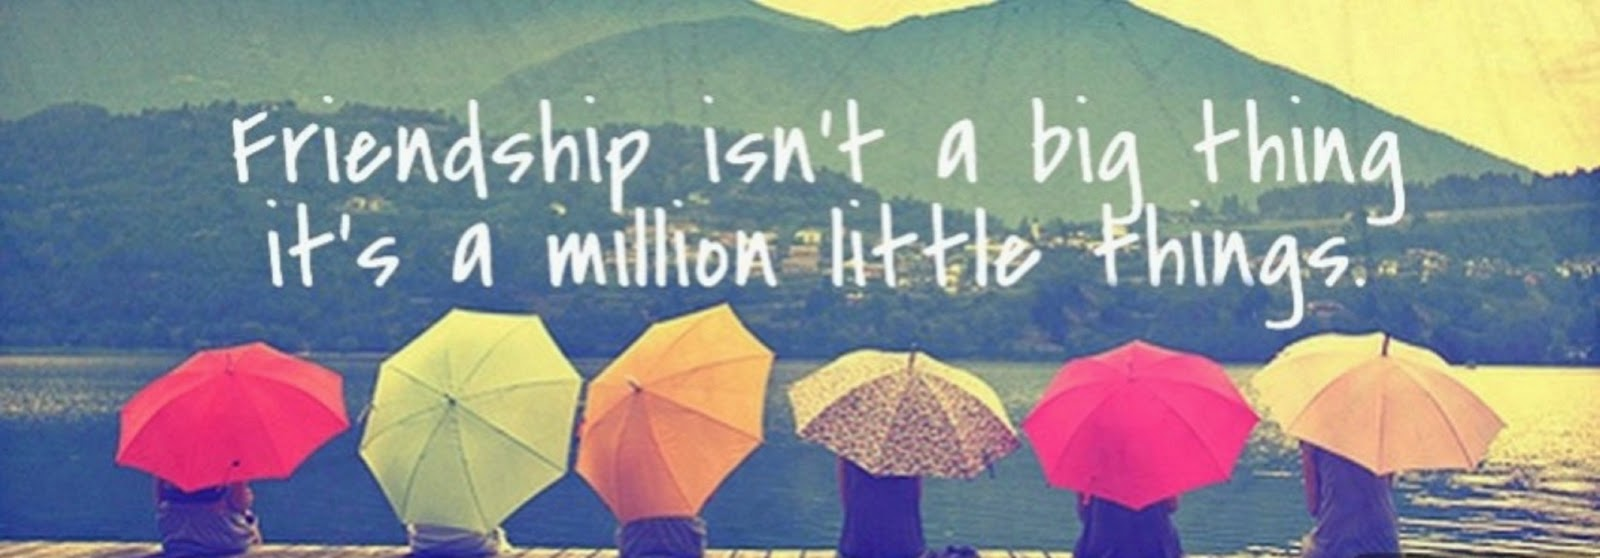 wallpaper friendship facebook - photo #15